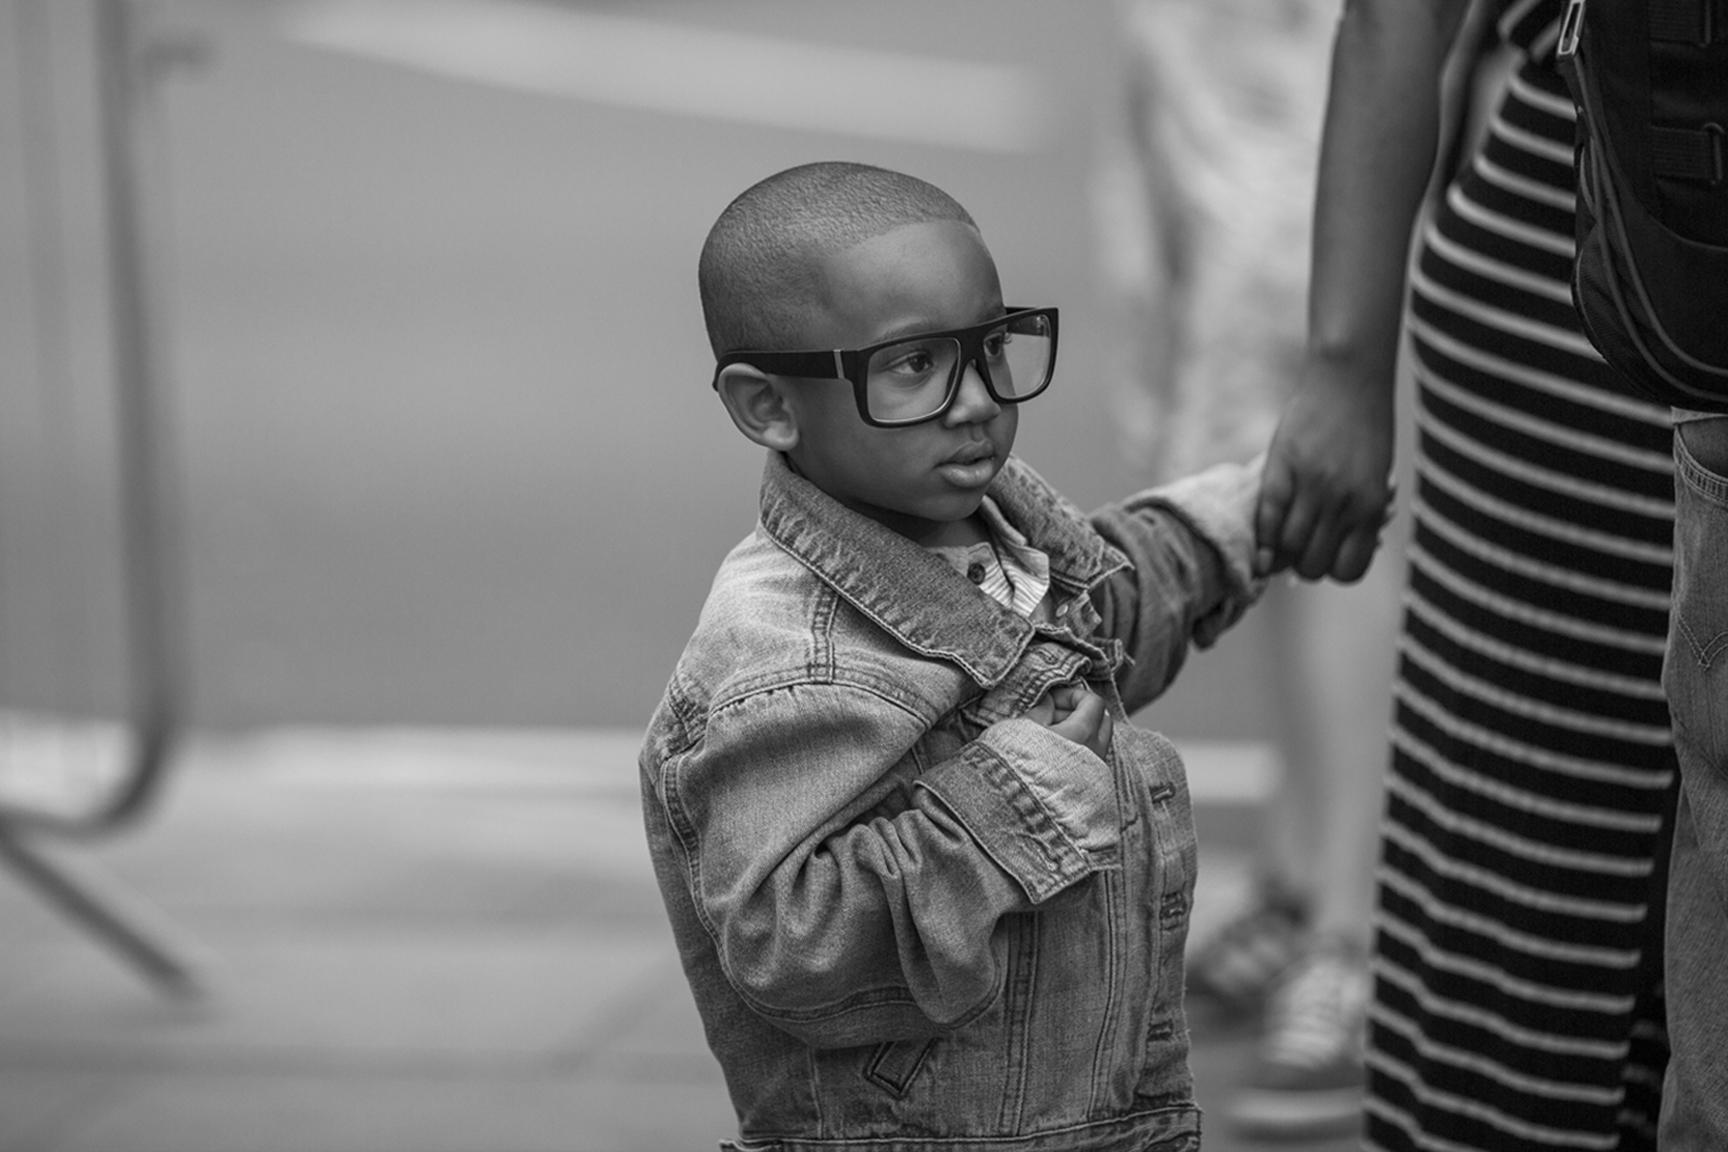 Street style photographer